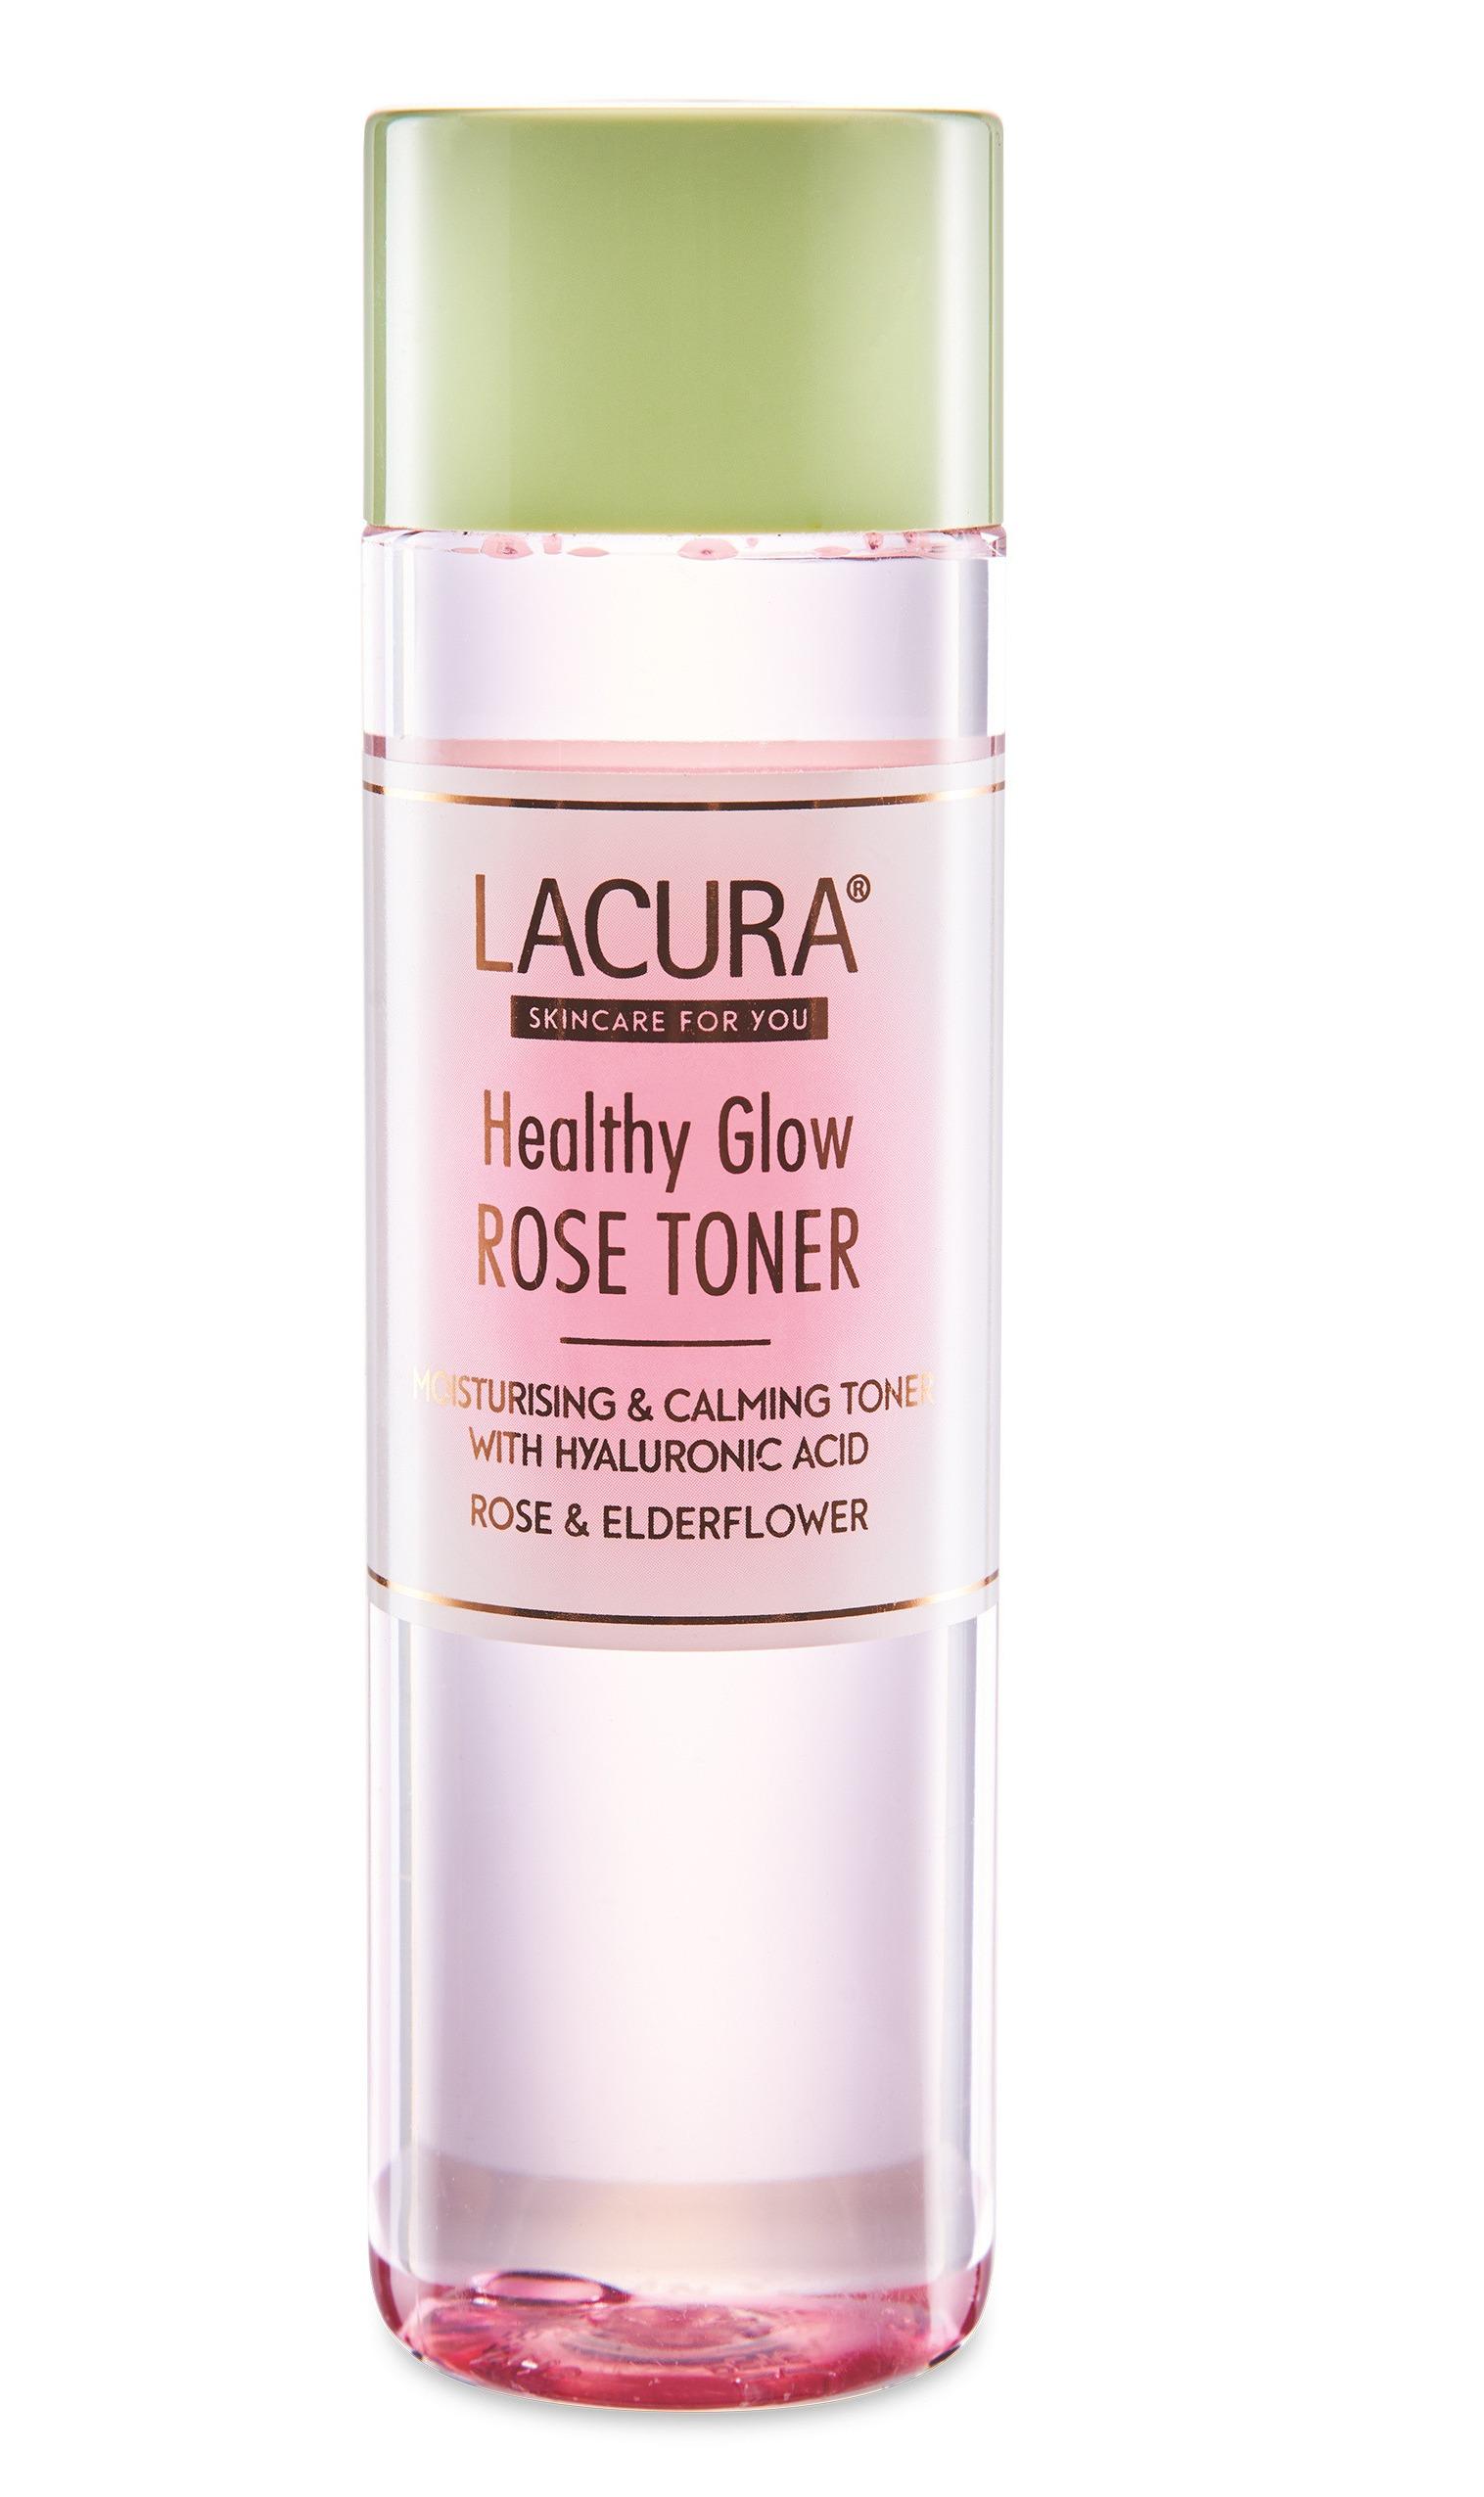 LACURA Healthy Glow Rose Toner